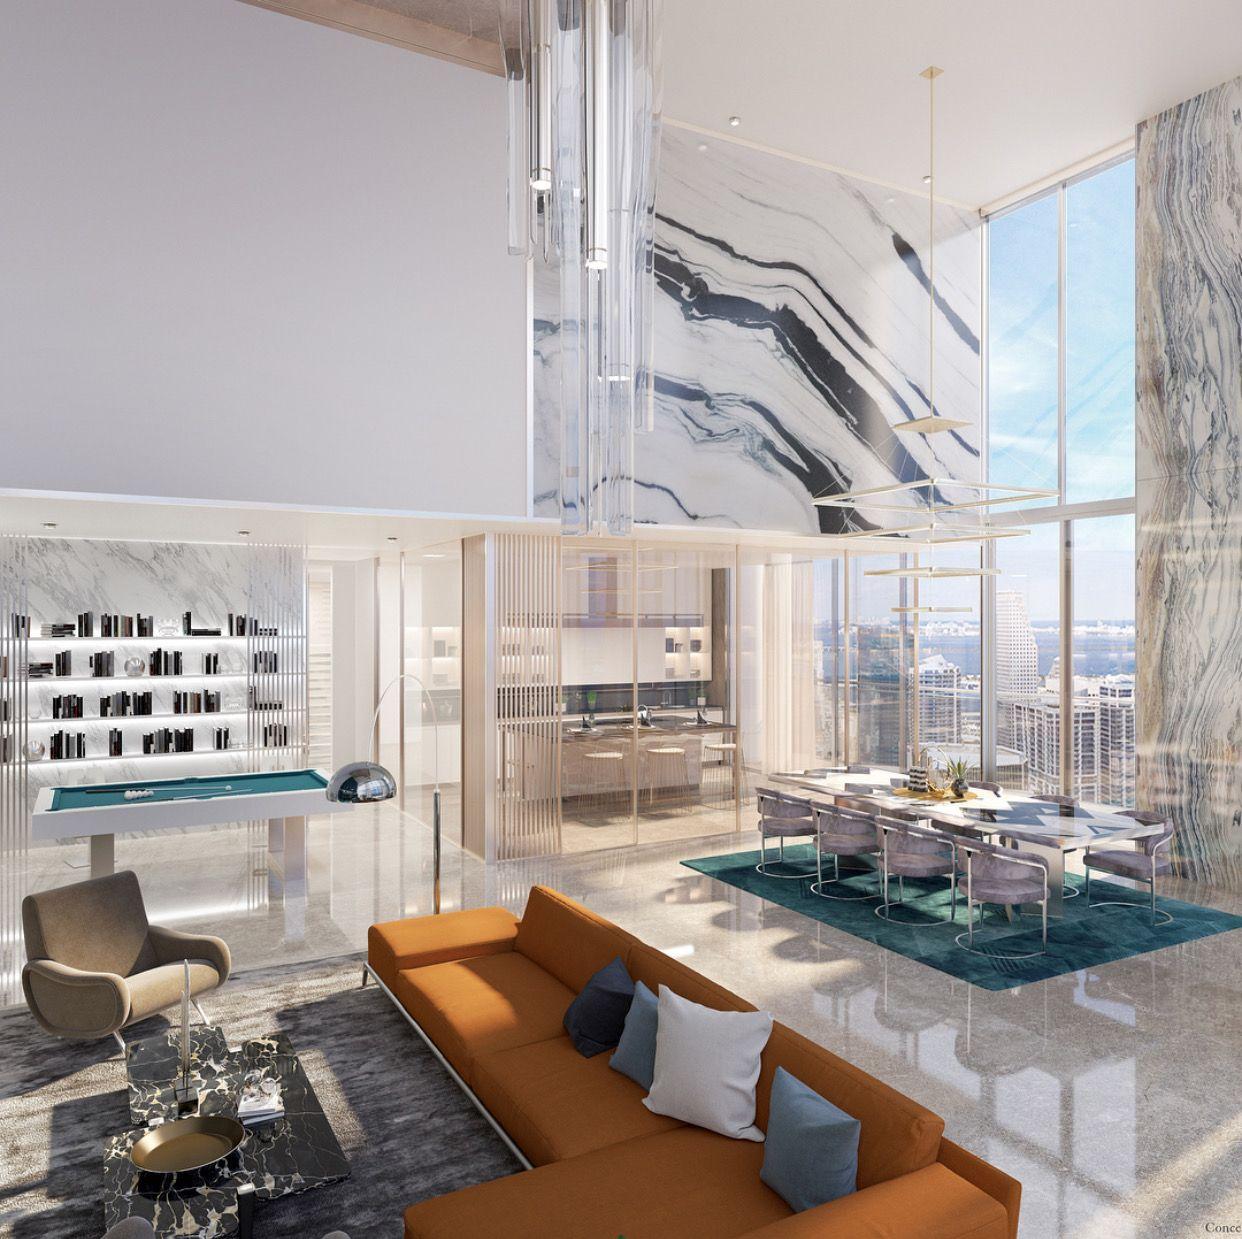 Pin by Boris Vasovski on Ideas for Interior Design | Best ...